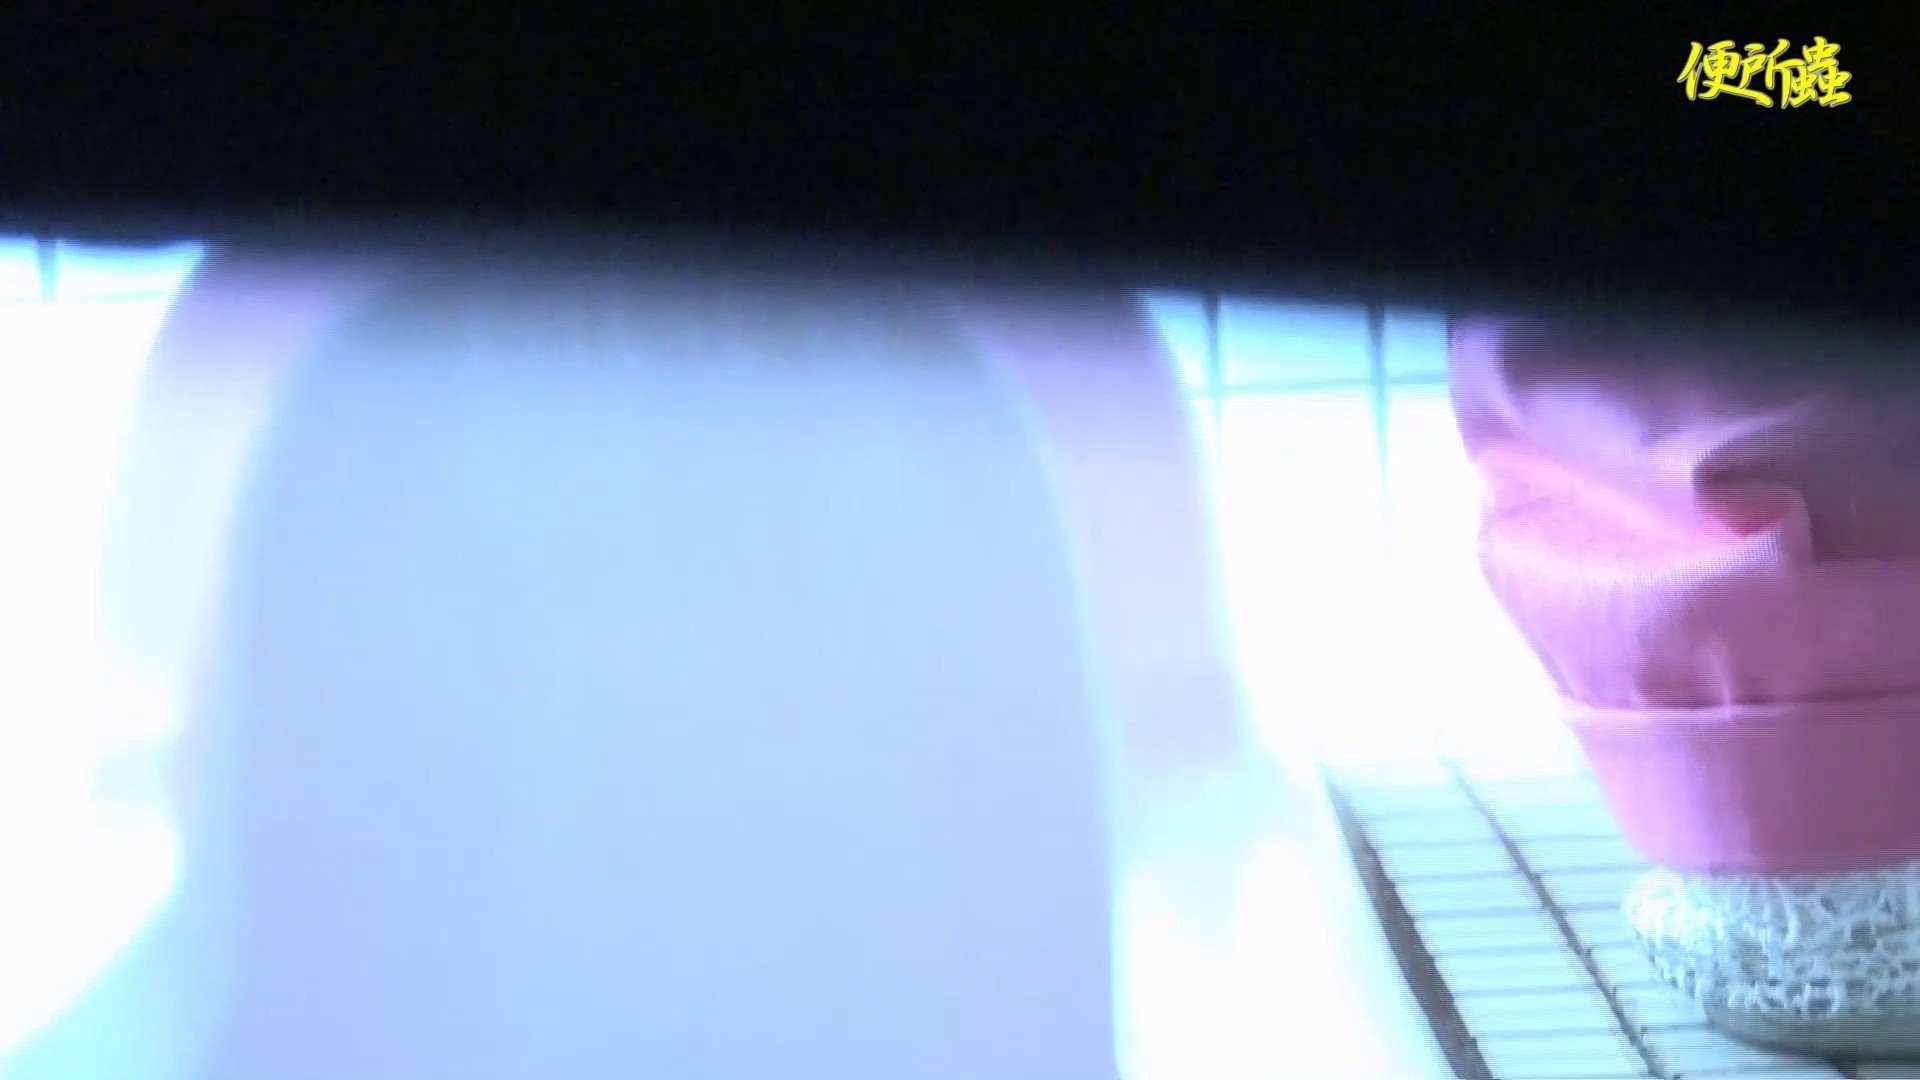 vol.01 便所蟲さんのリターン~便所蟲2匹目~ 丸見え AV動画キャプチャ 106画像 22